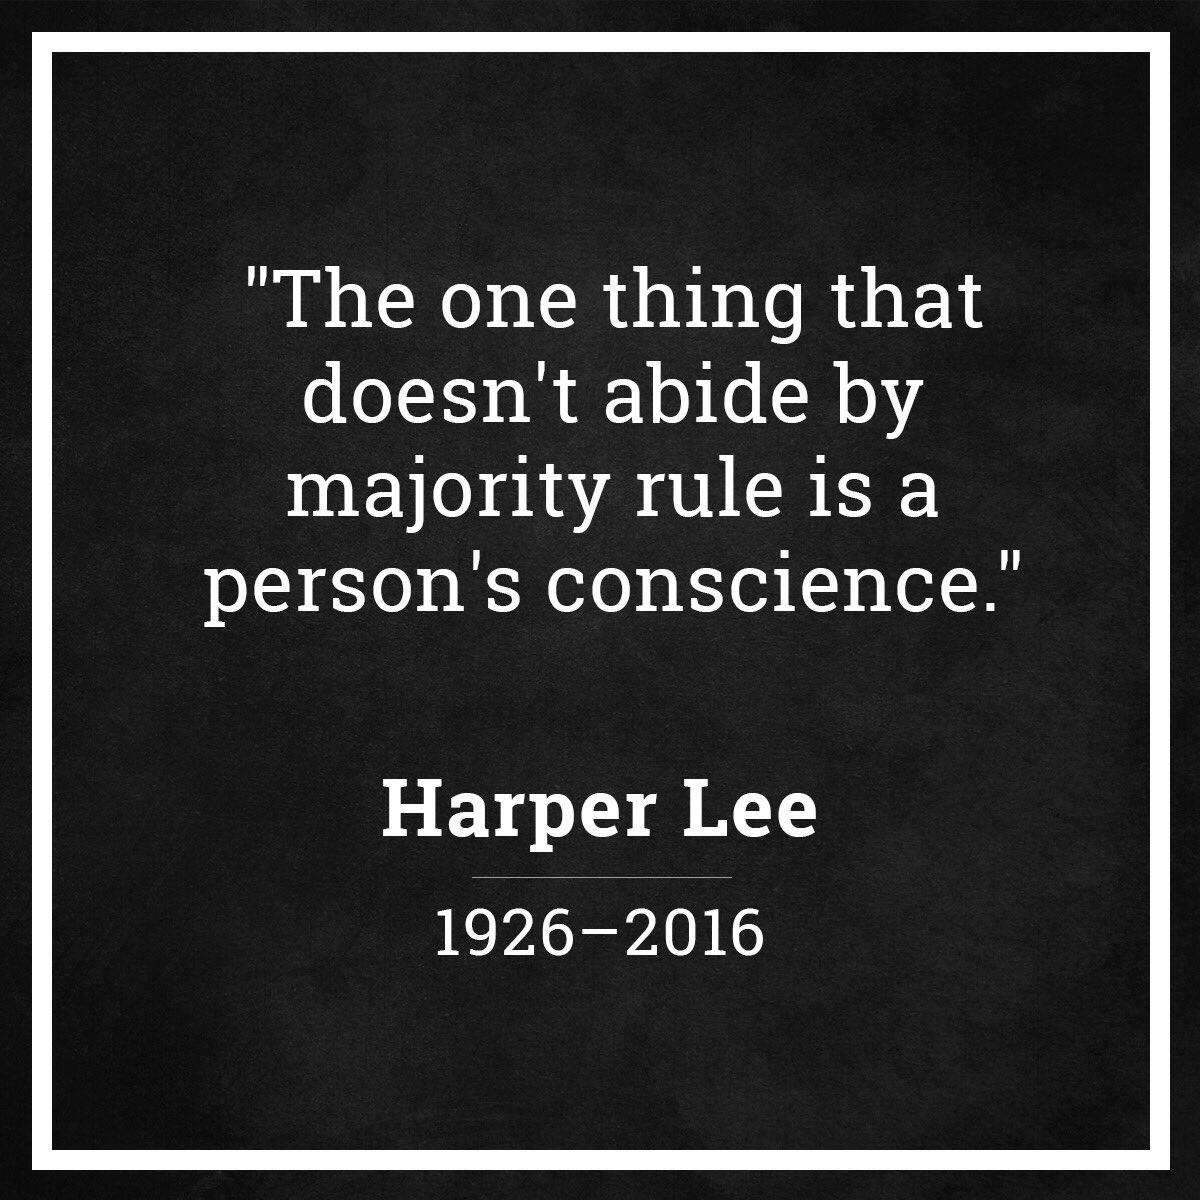 RIP, Harper Lee #tokillamockingbird https://t.co/VHofatgS8A